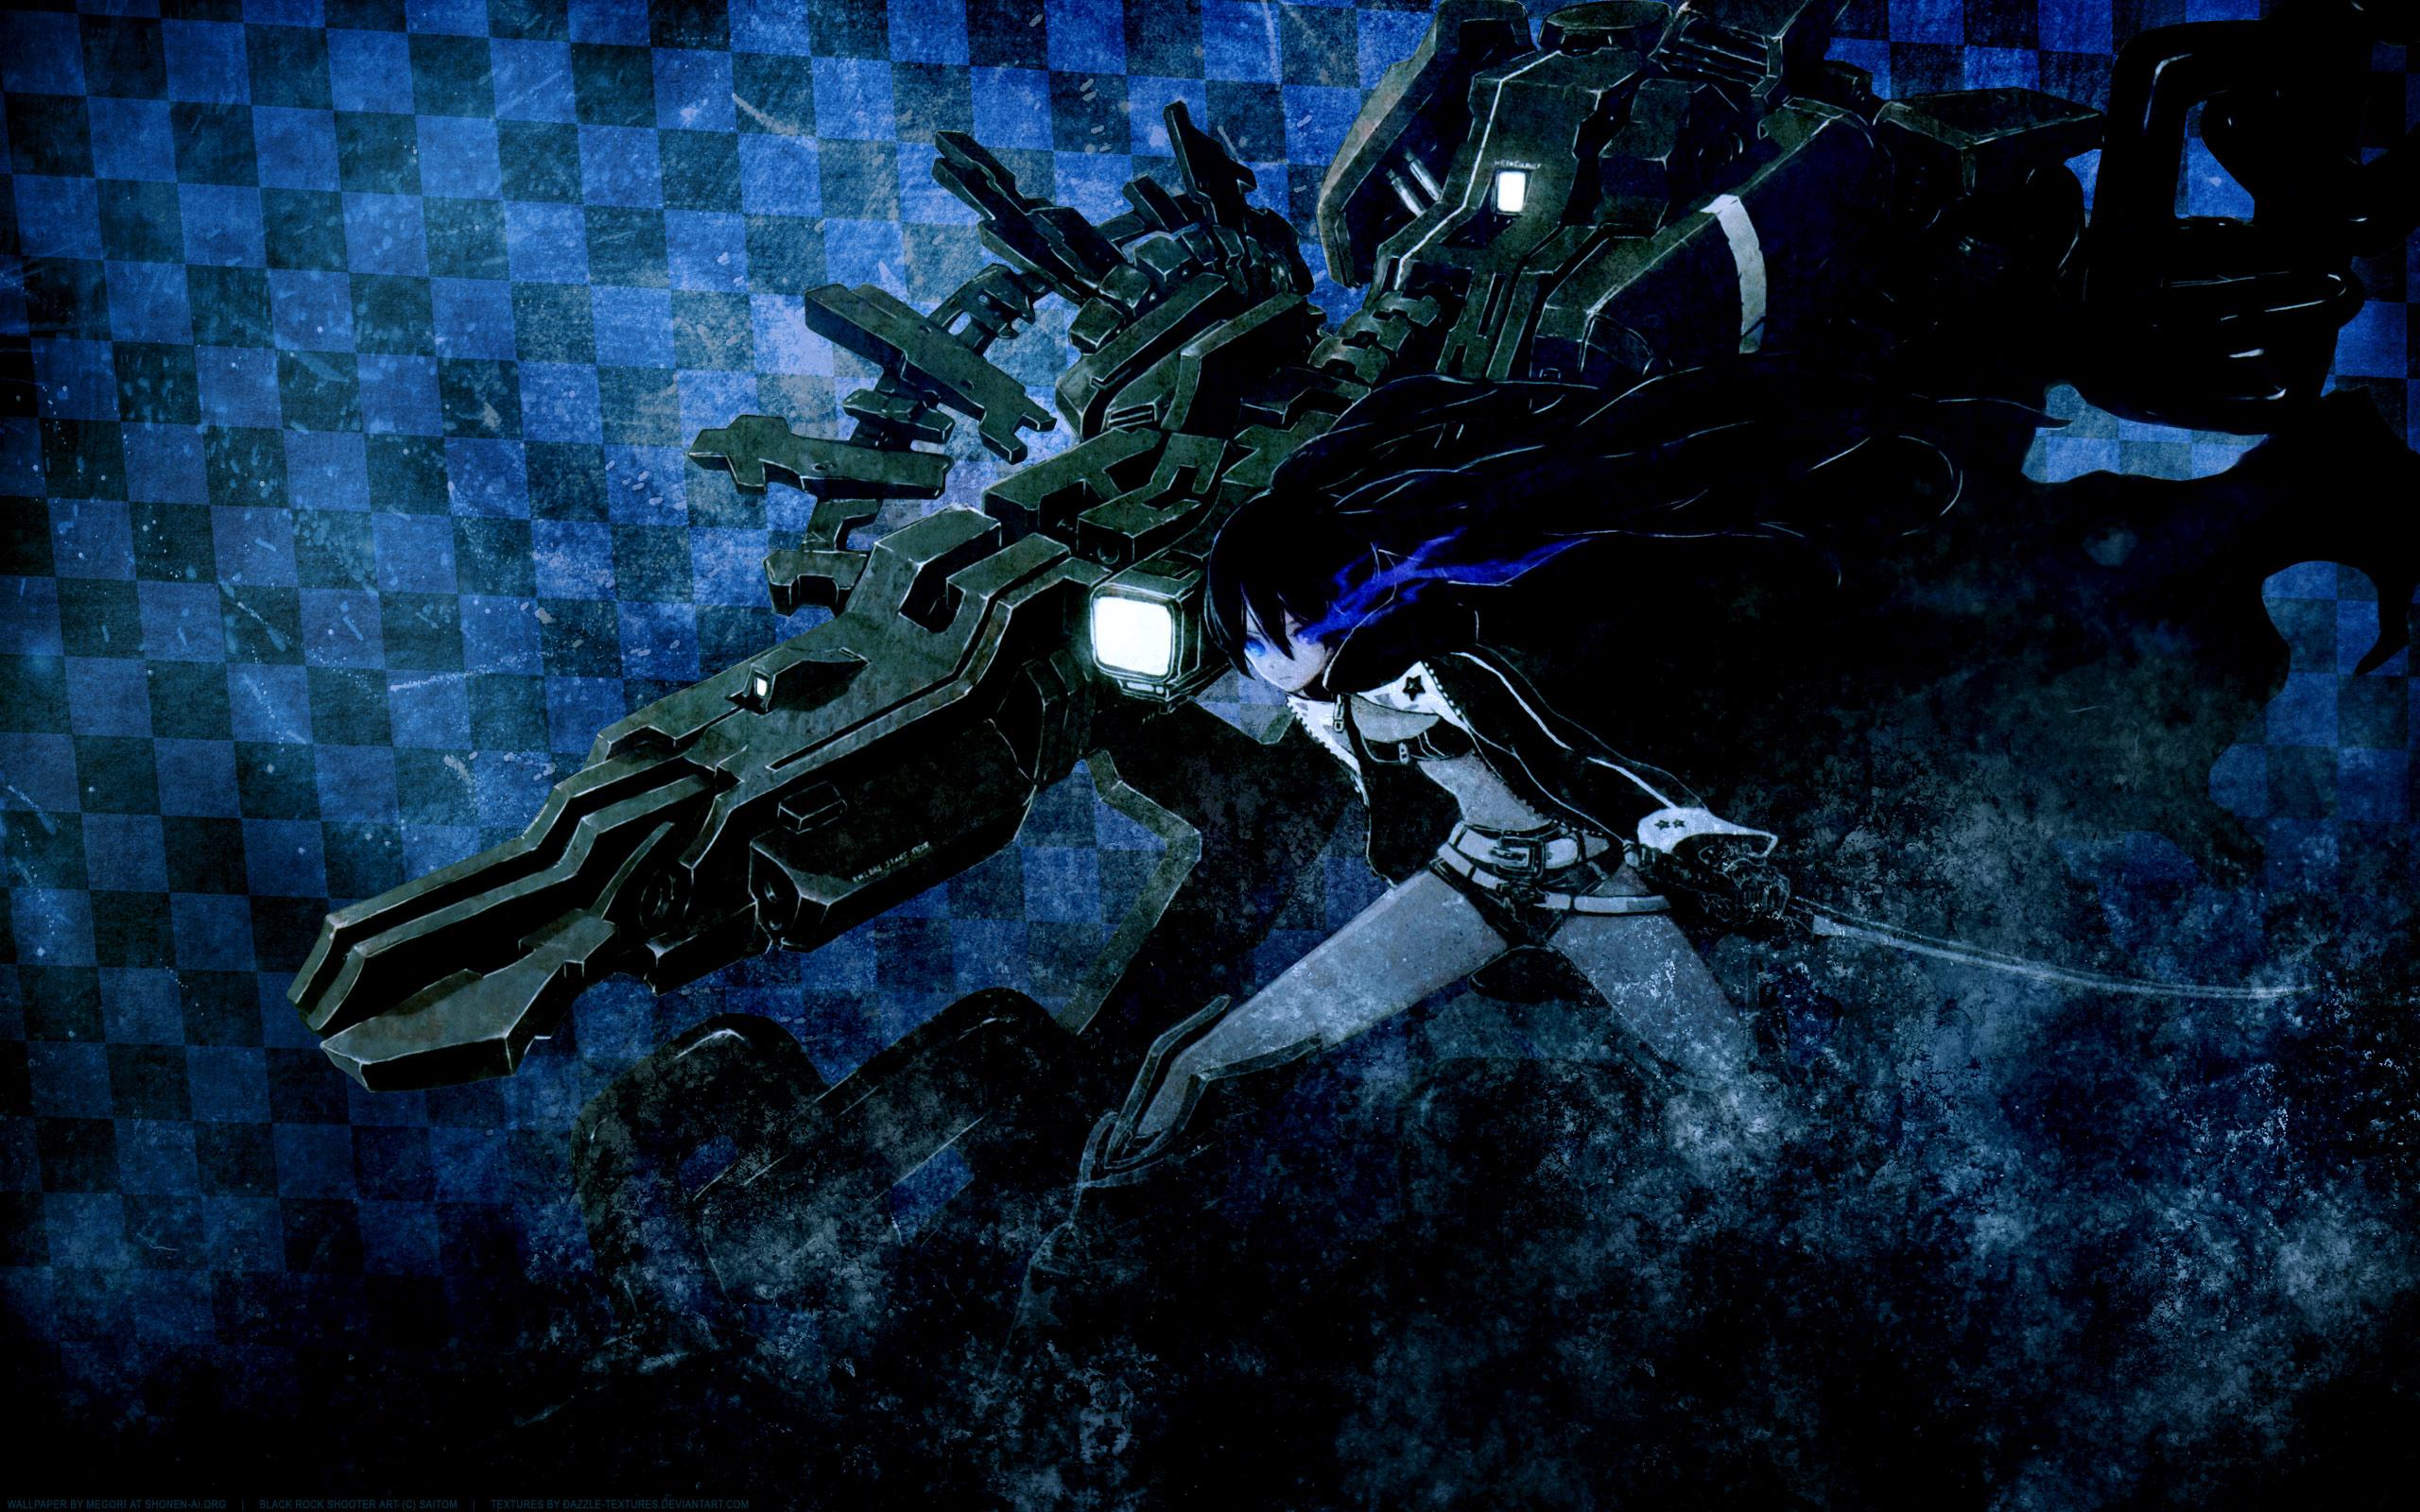 Black rock shooter full hd wallpaper and background image - Full hd anime wallpaper pack ...